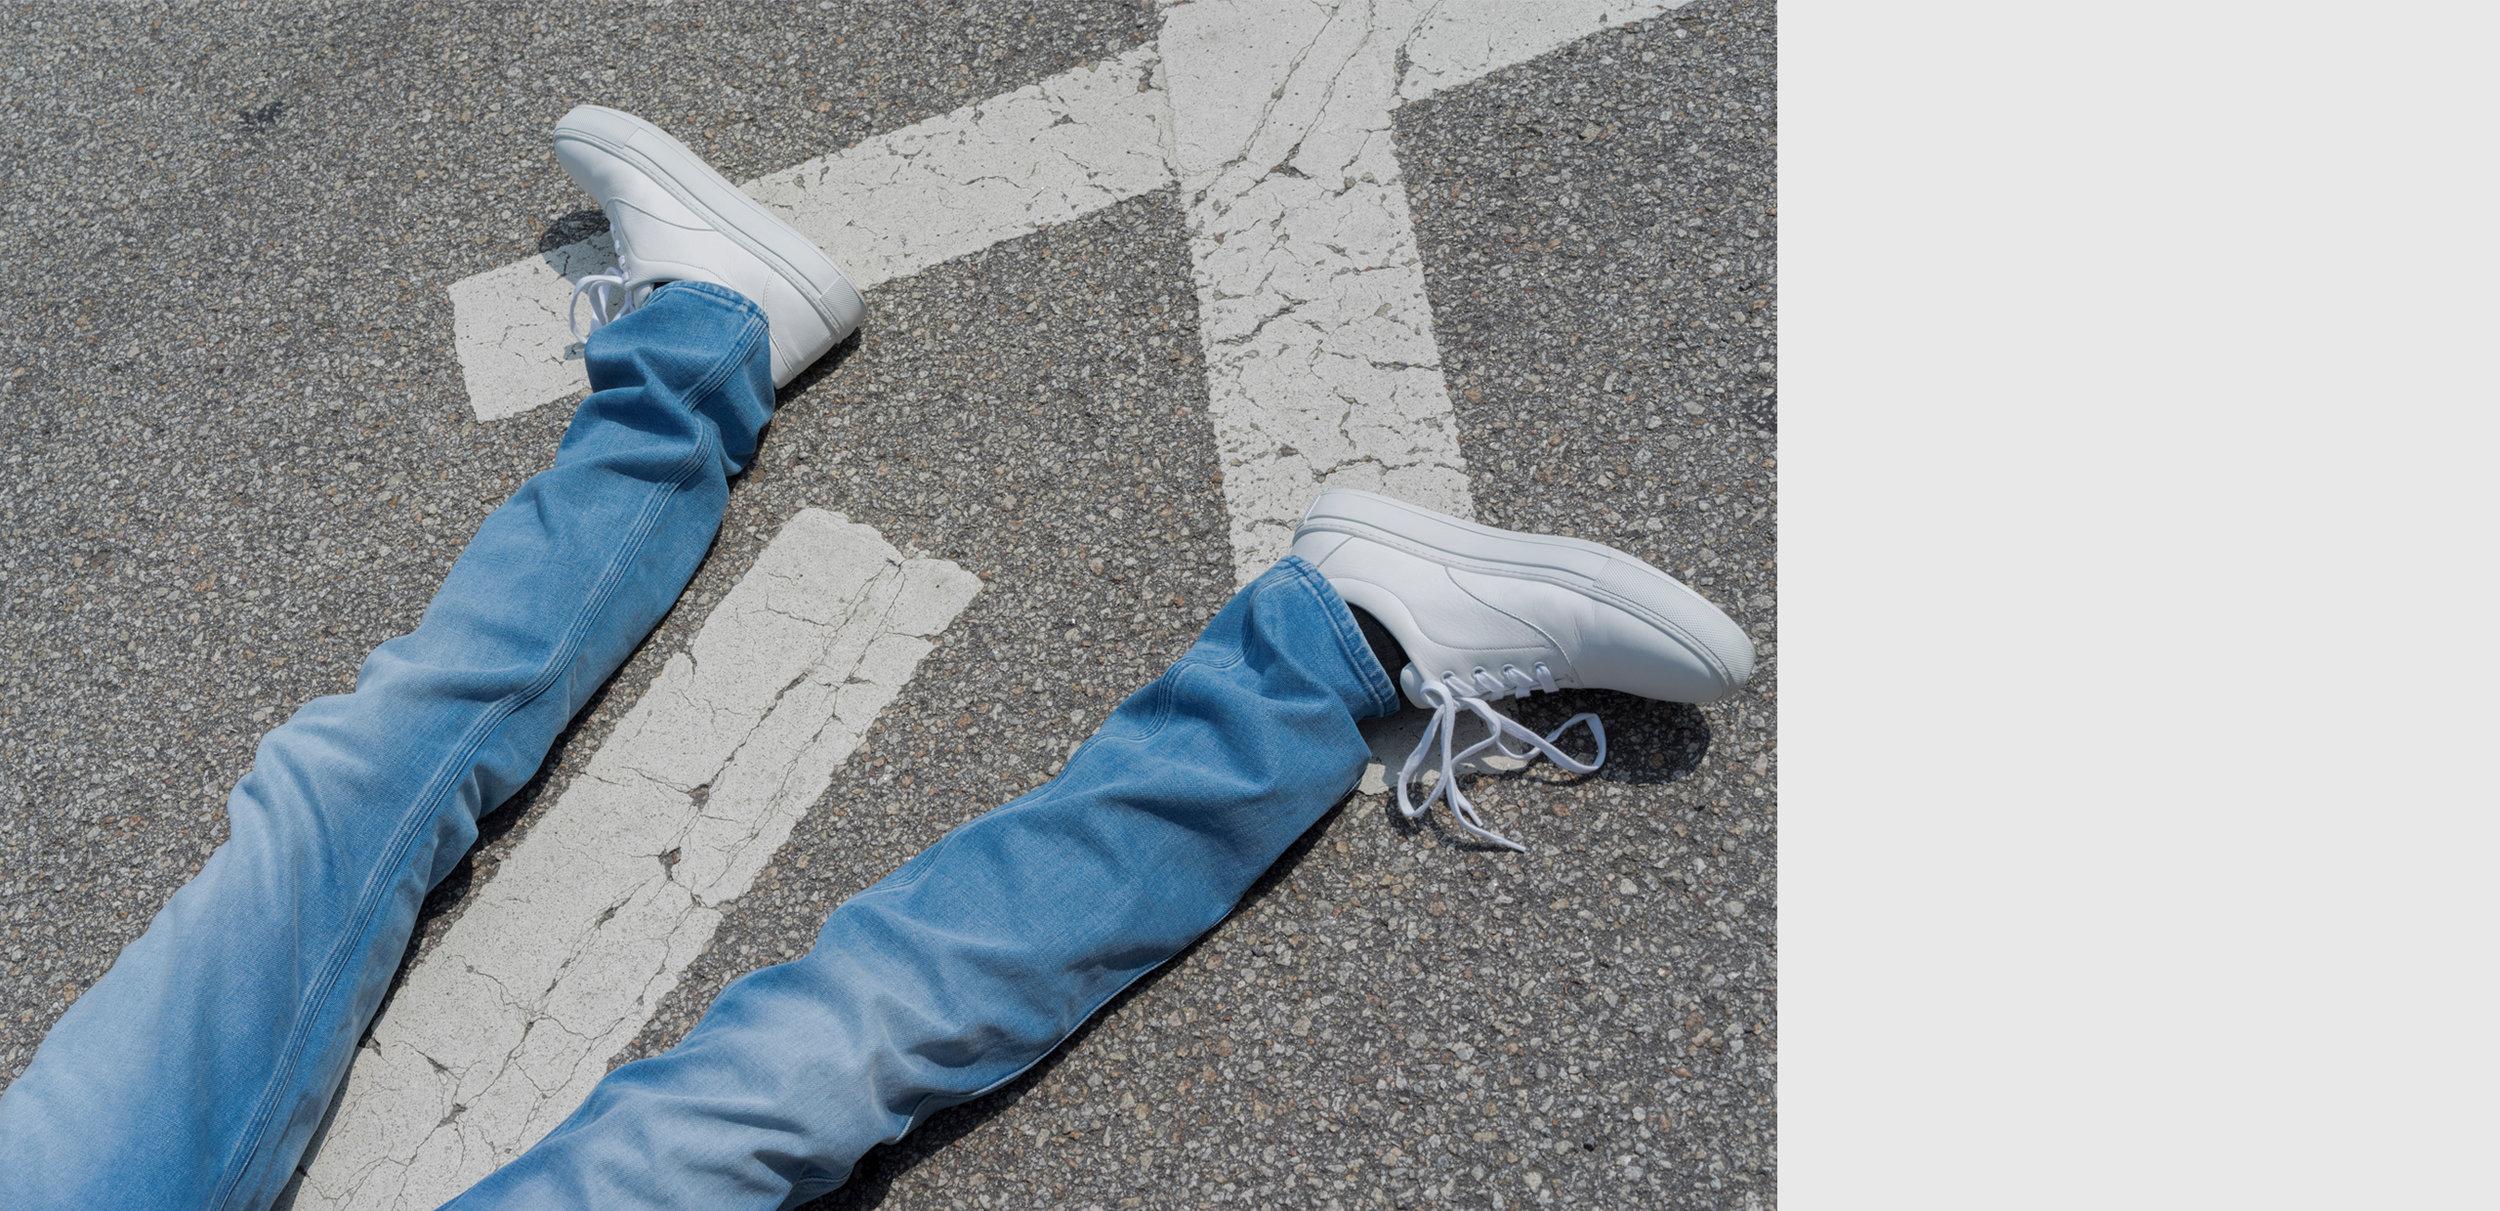 balmoral-01-leather-white-m-1.jpg